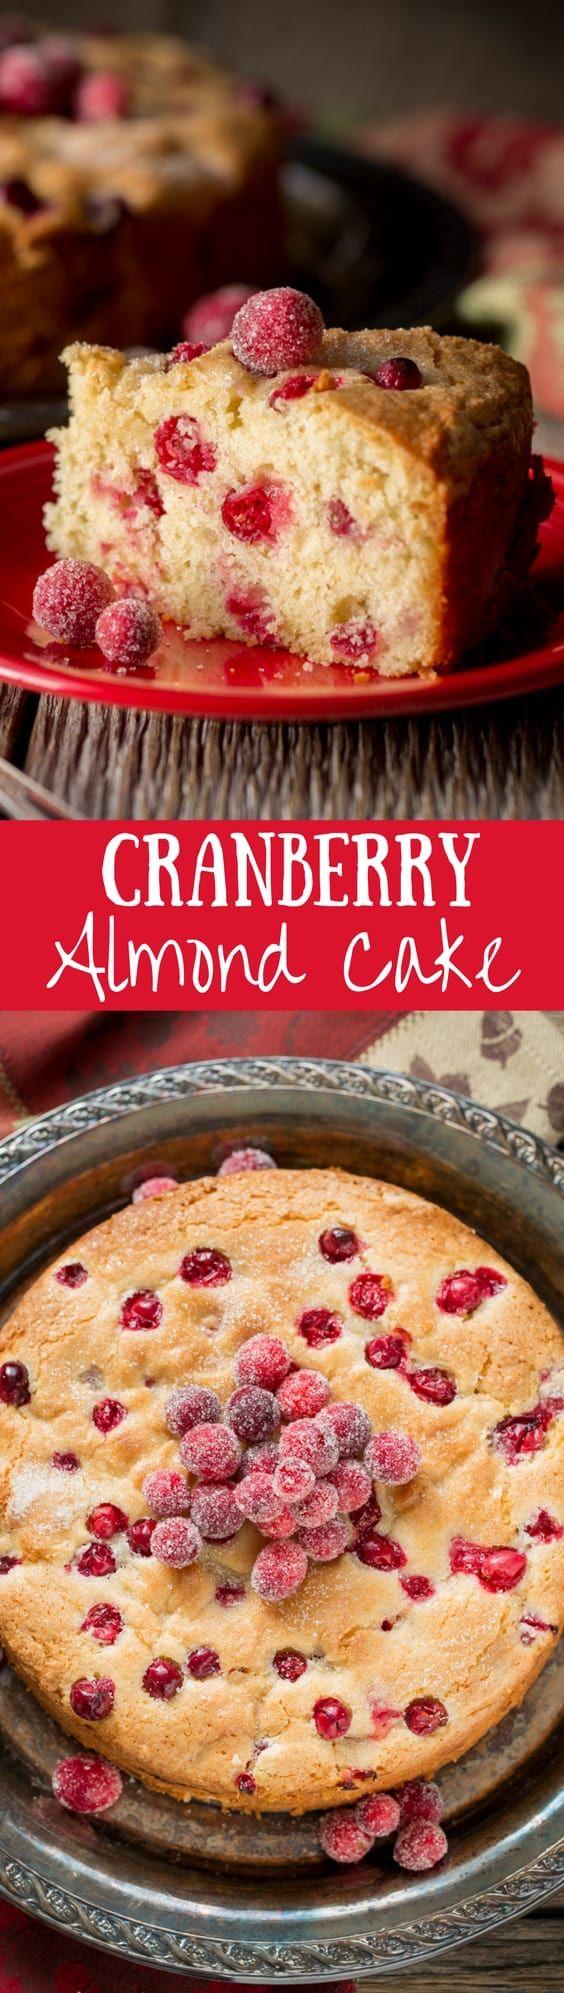 684 best Cake Recipes images on Pinterest